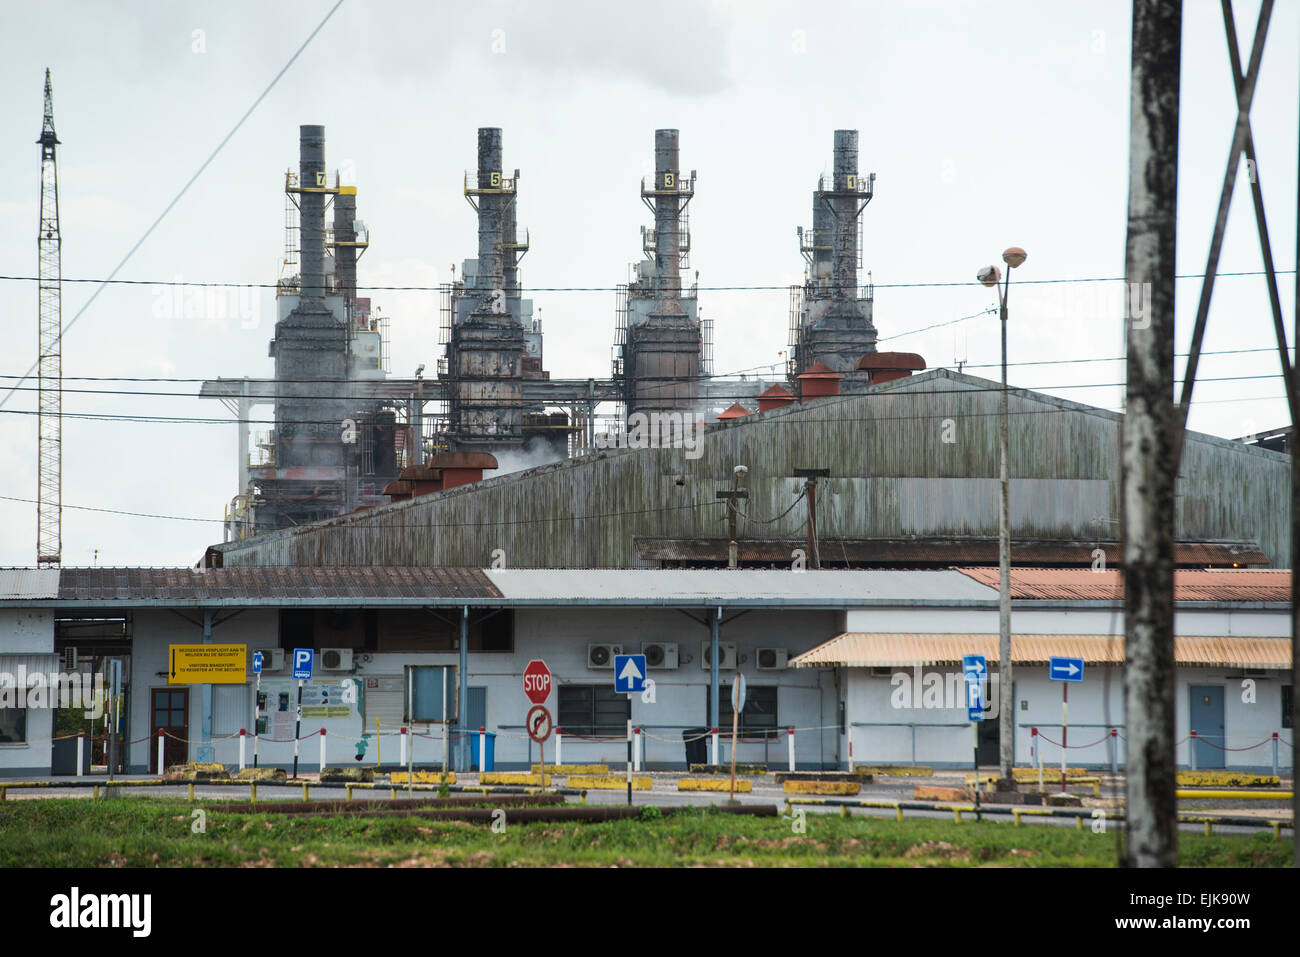 Bauxite factory, Suriname - Stock Image